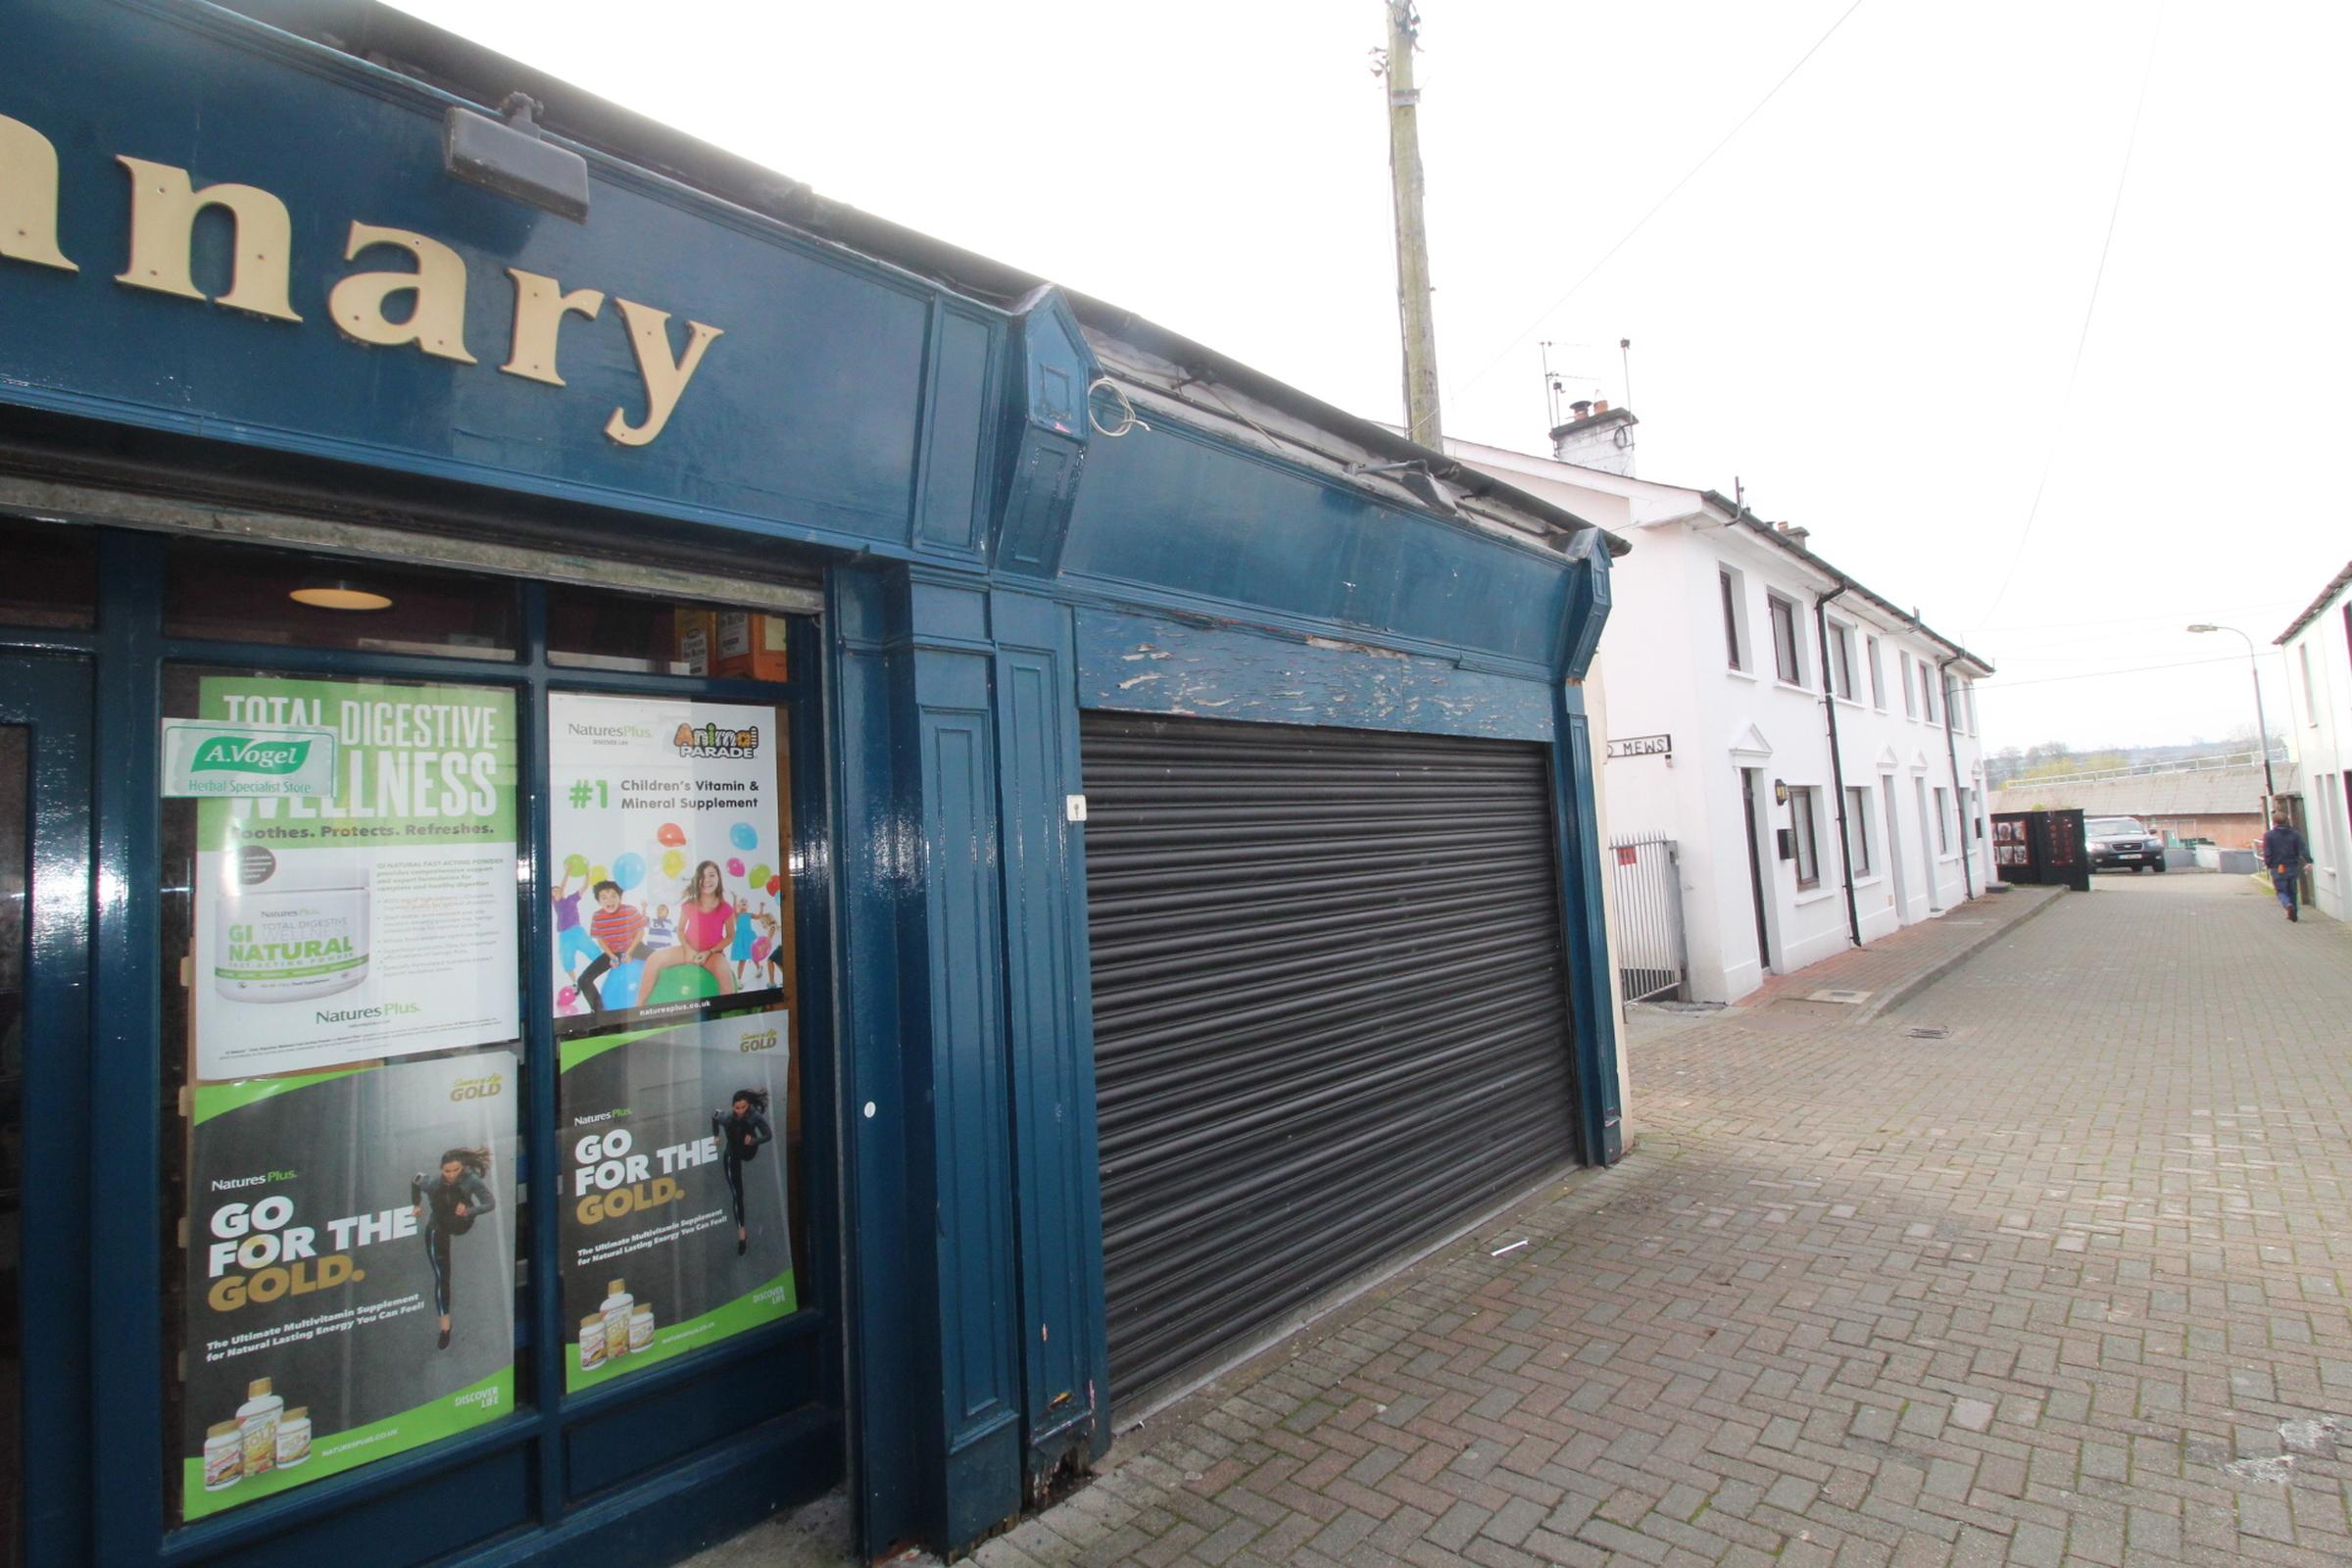 Deal Yard Lane, Mallow, Co. Cork